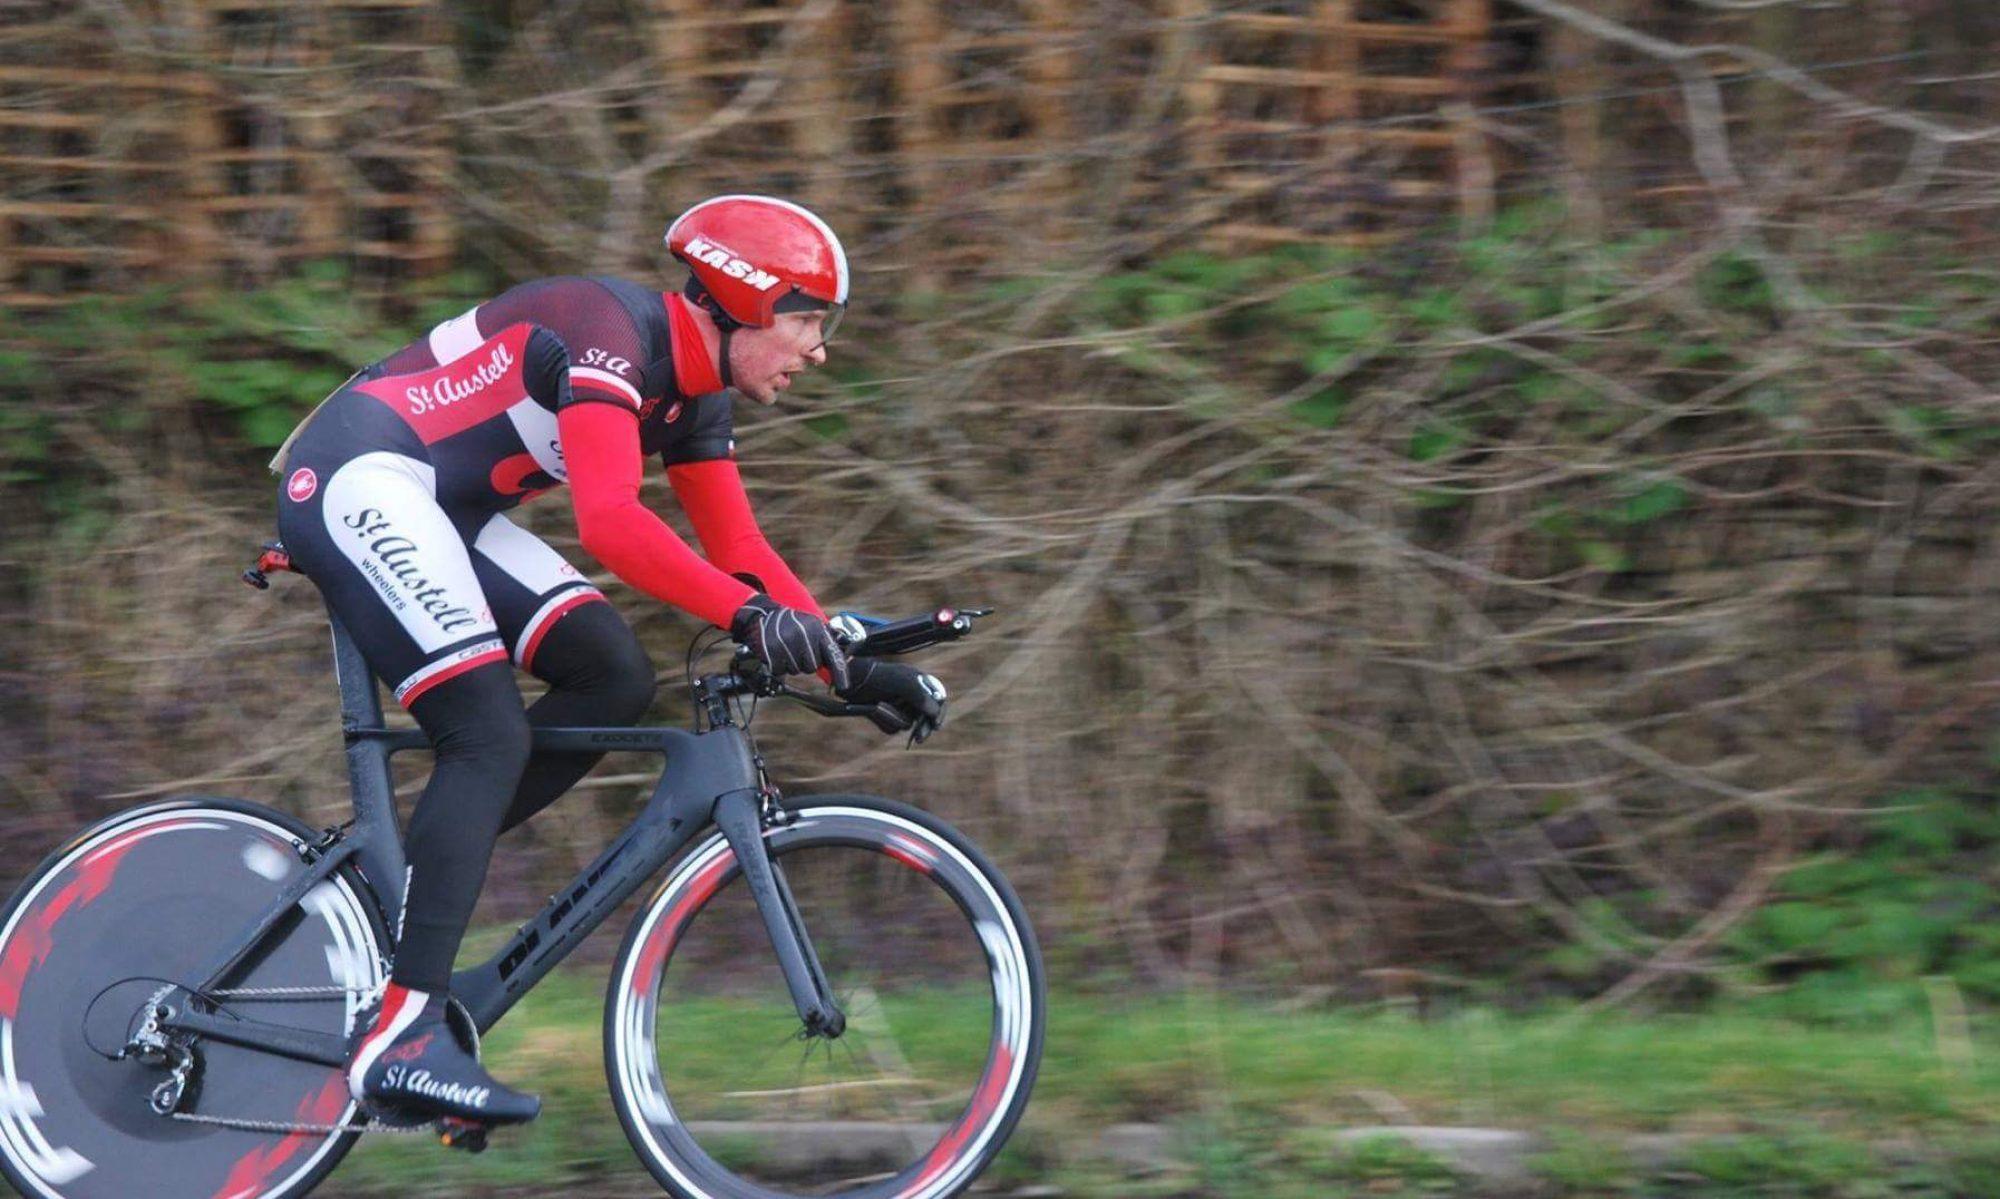 St Austell Wheelers Cycling Club